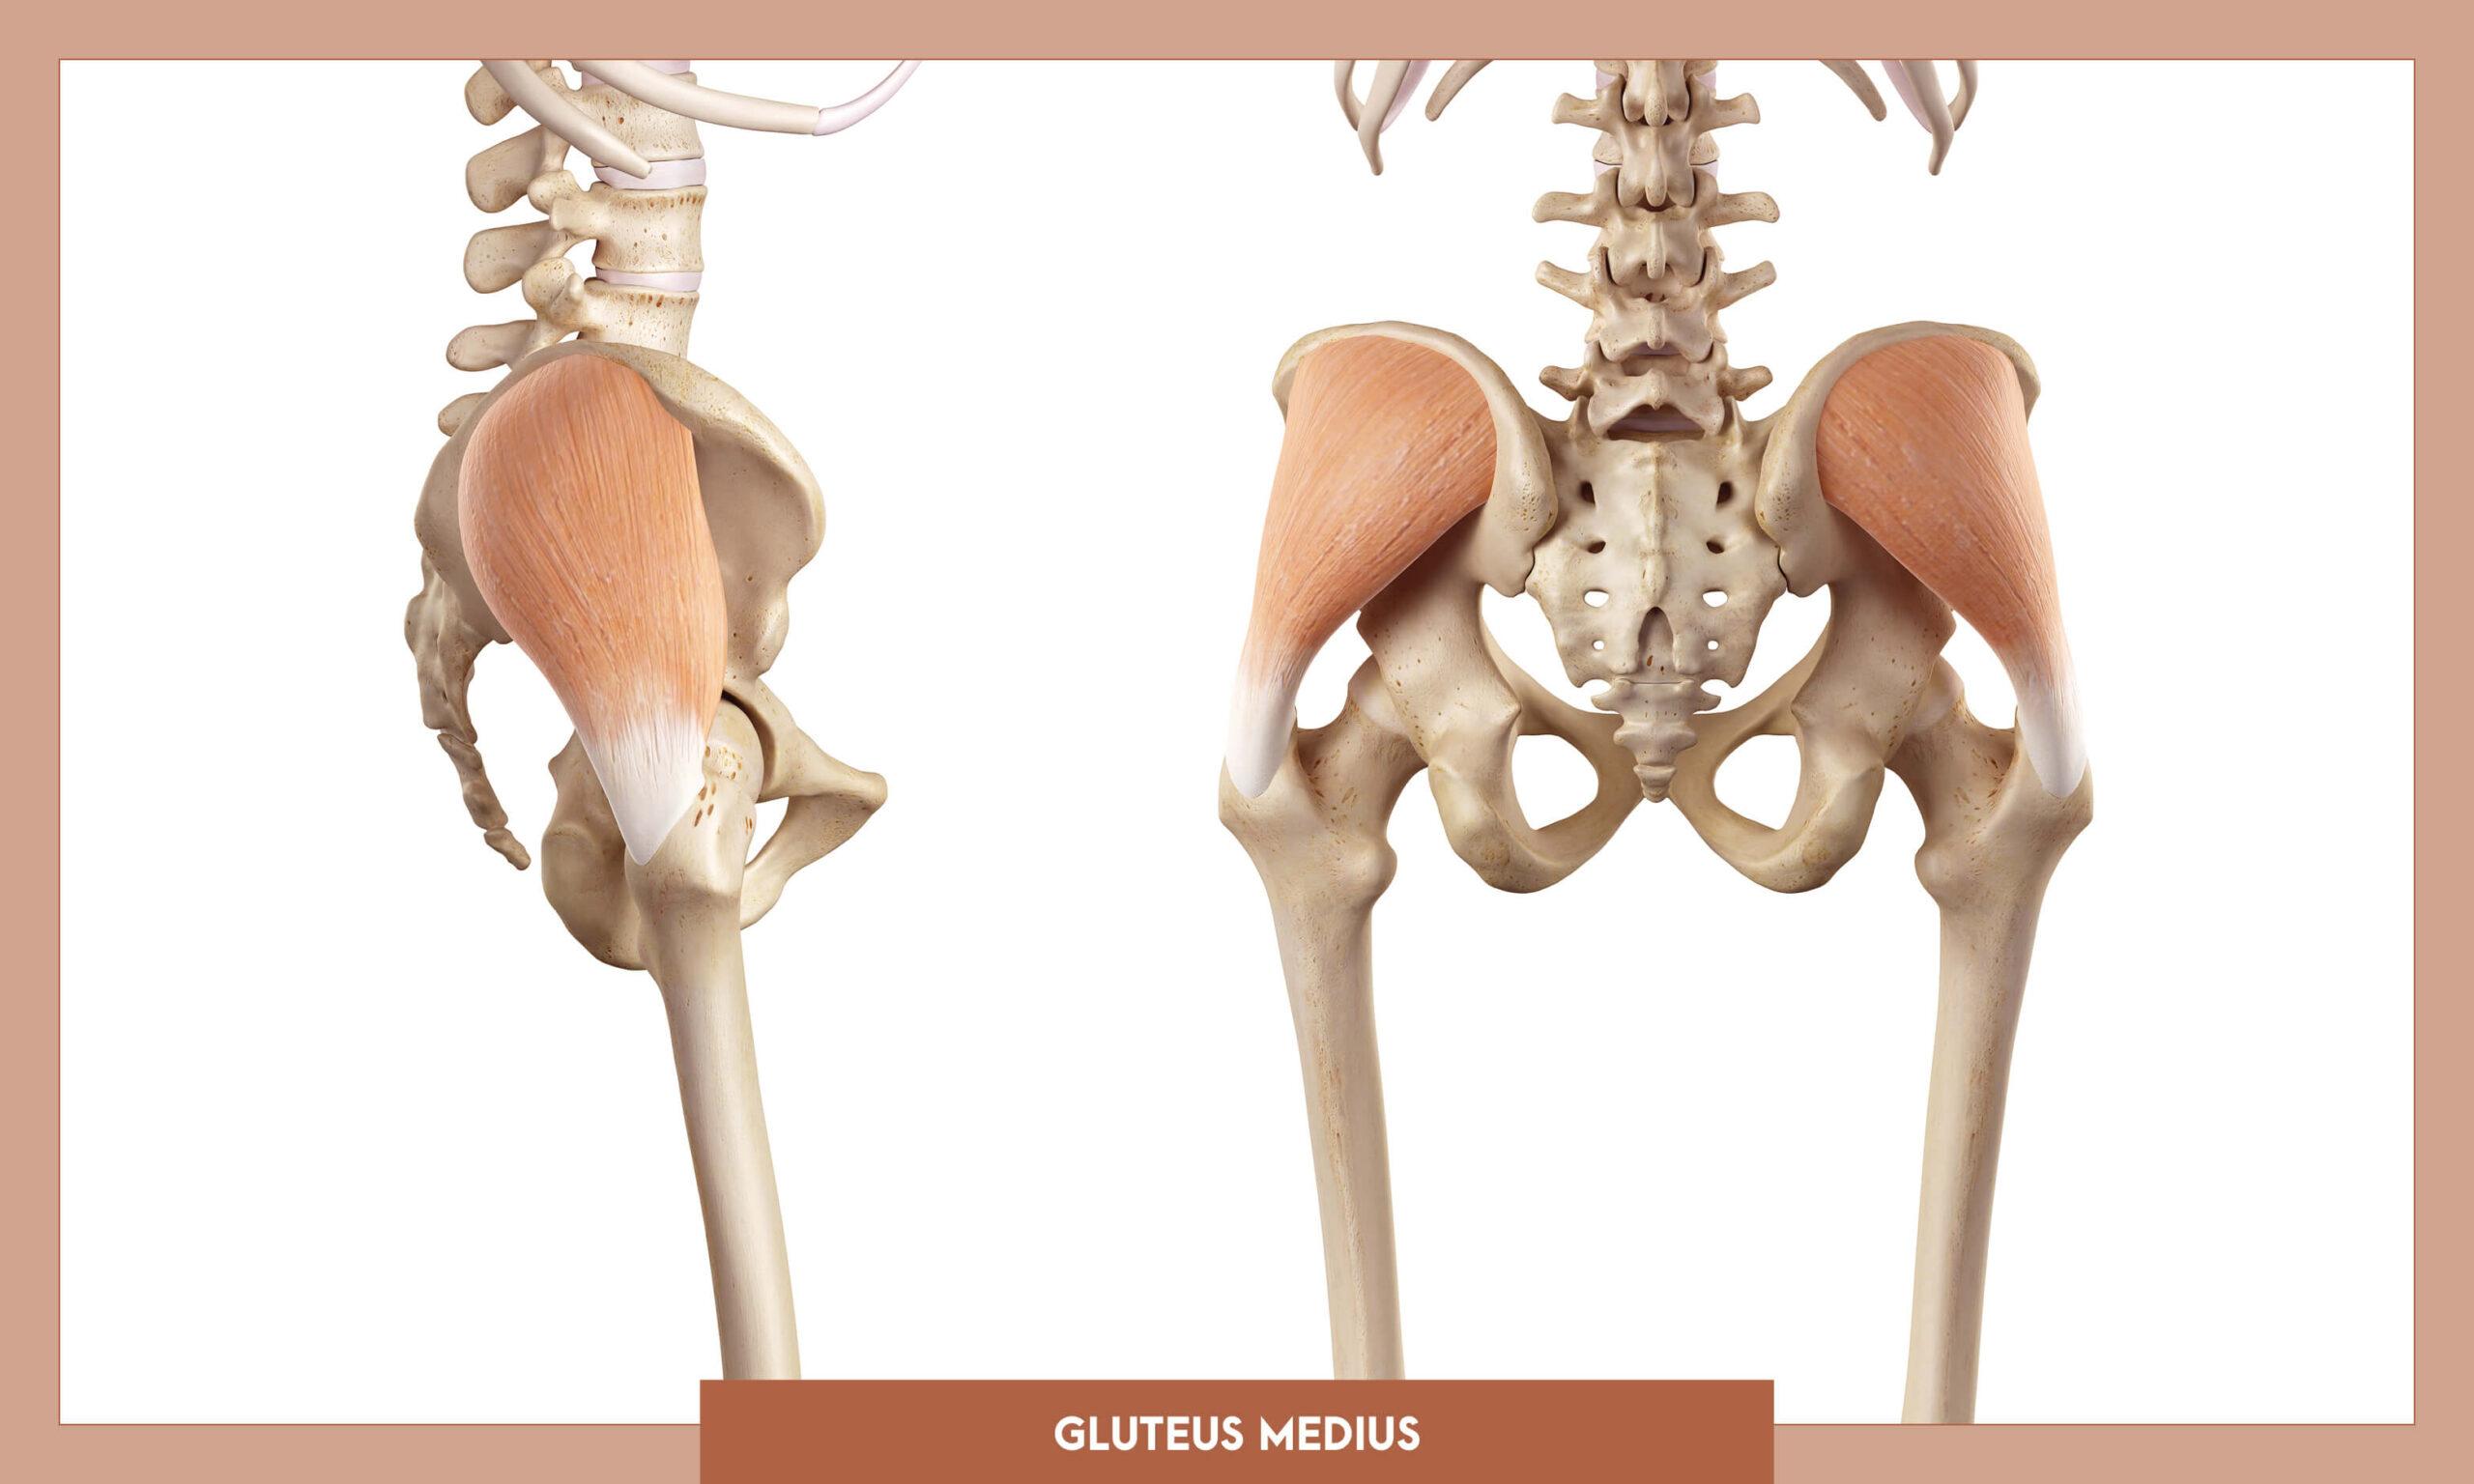 Muscles of thee Lower Limb - Gluteus medius